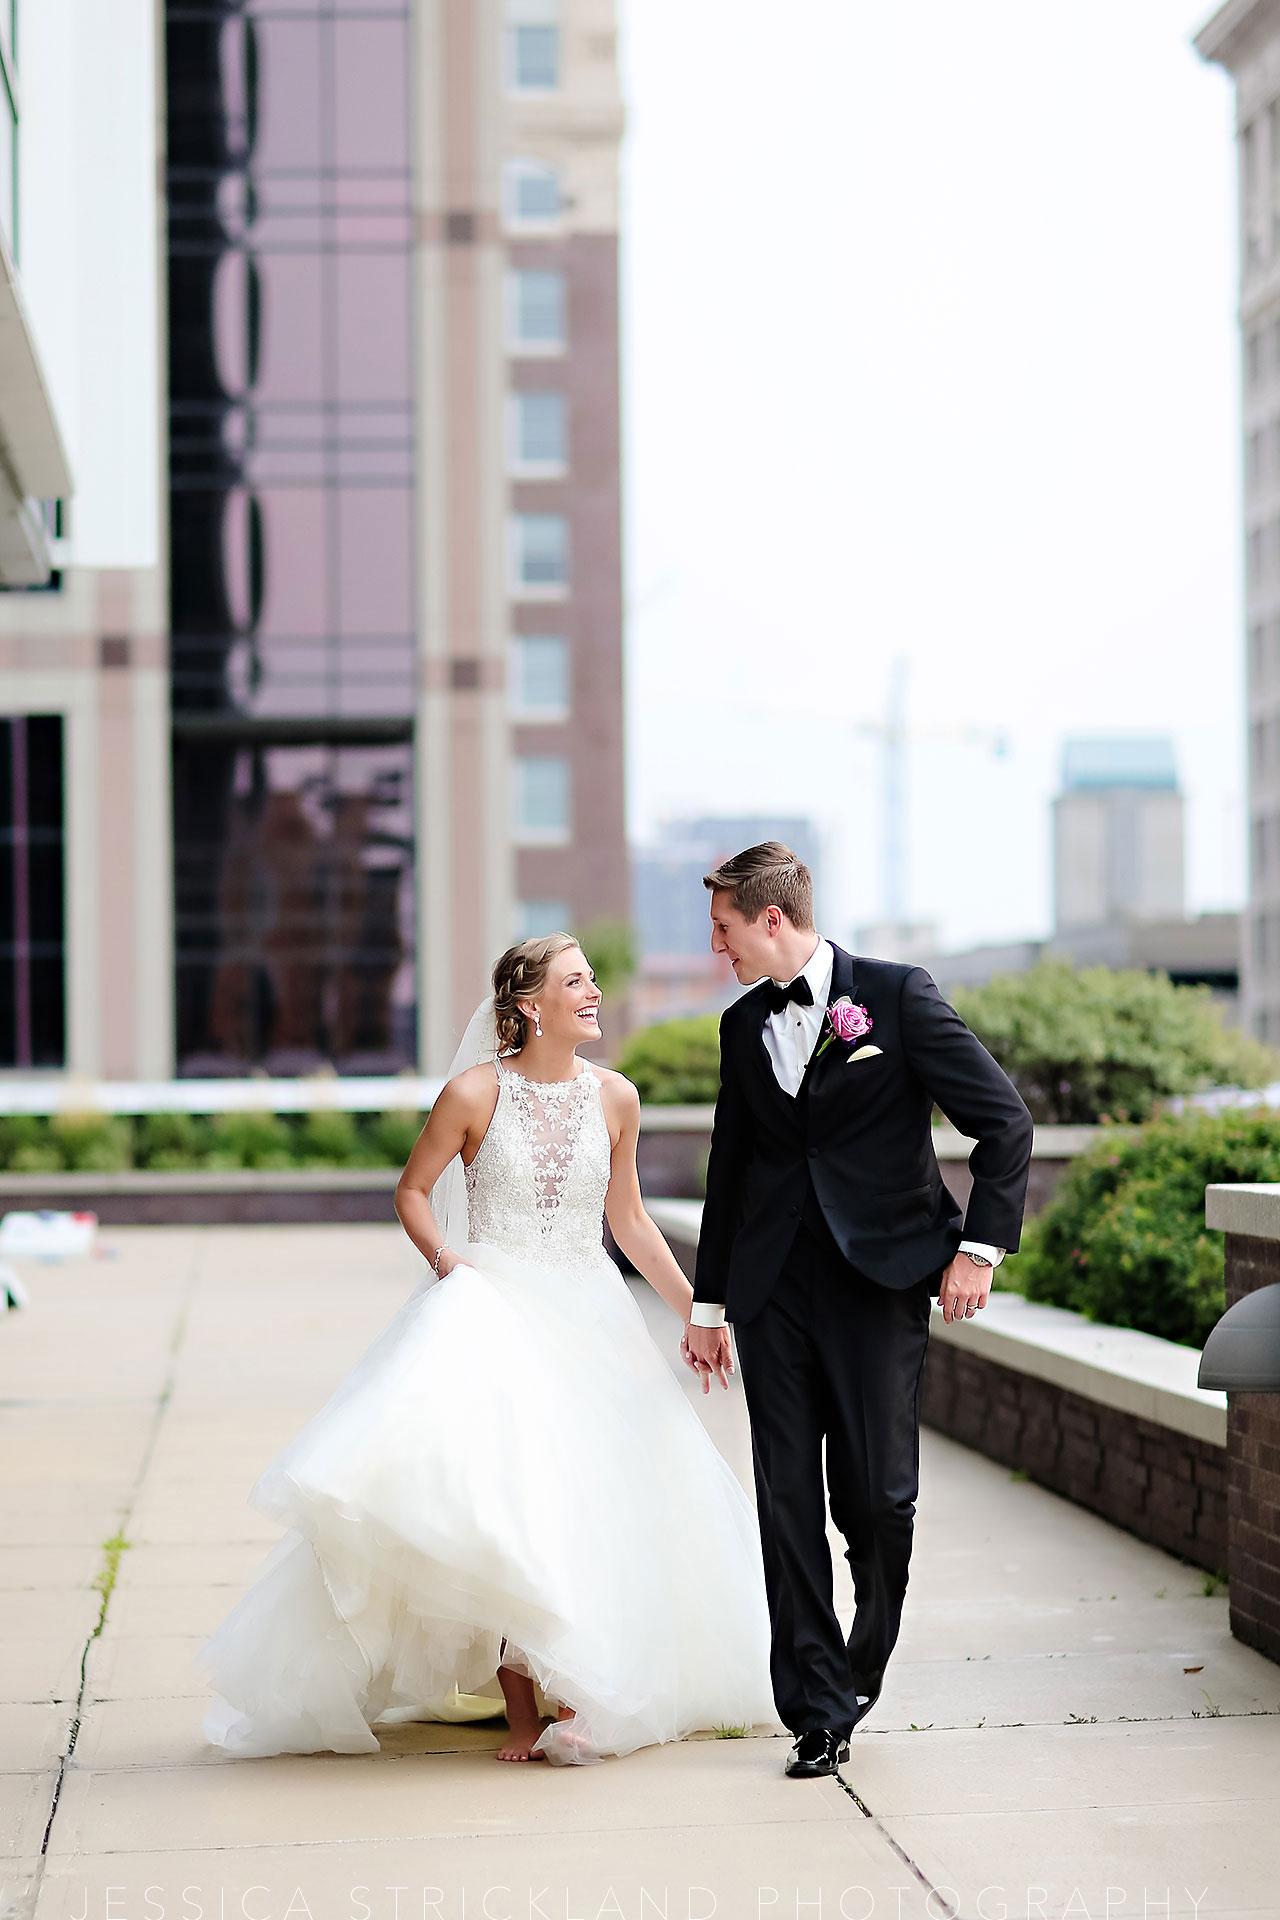 Serra Alex Regions Tower Indianapolis Wedding 234 watermarked